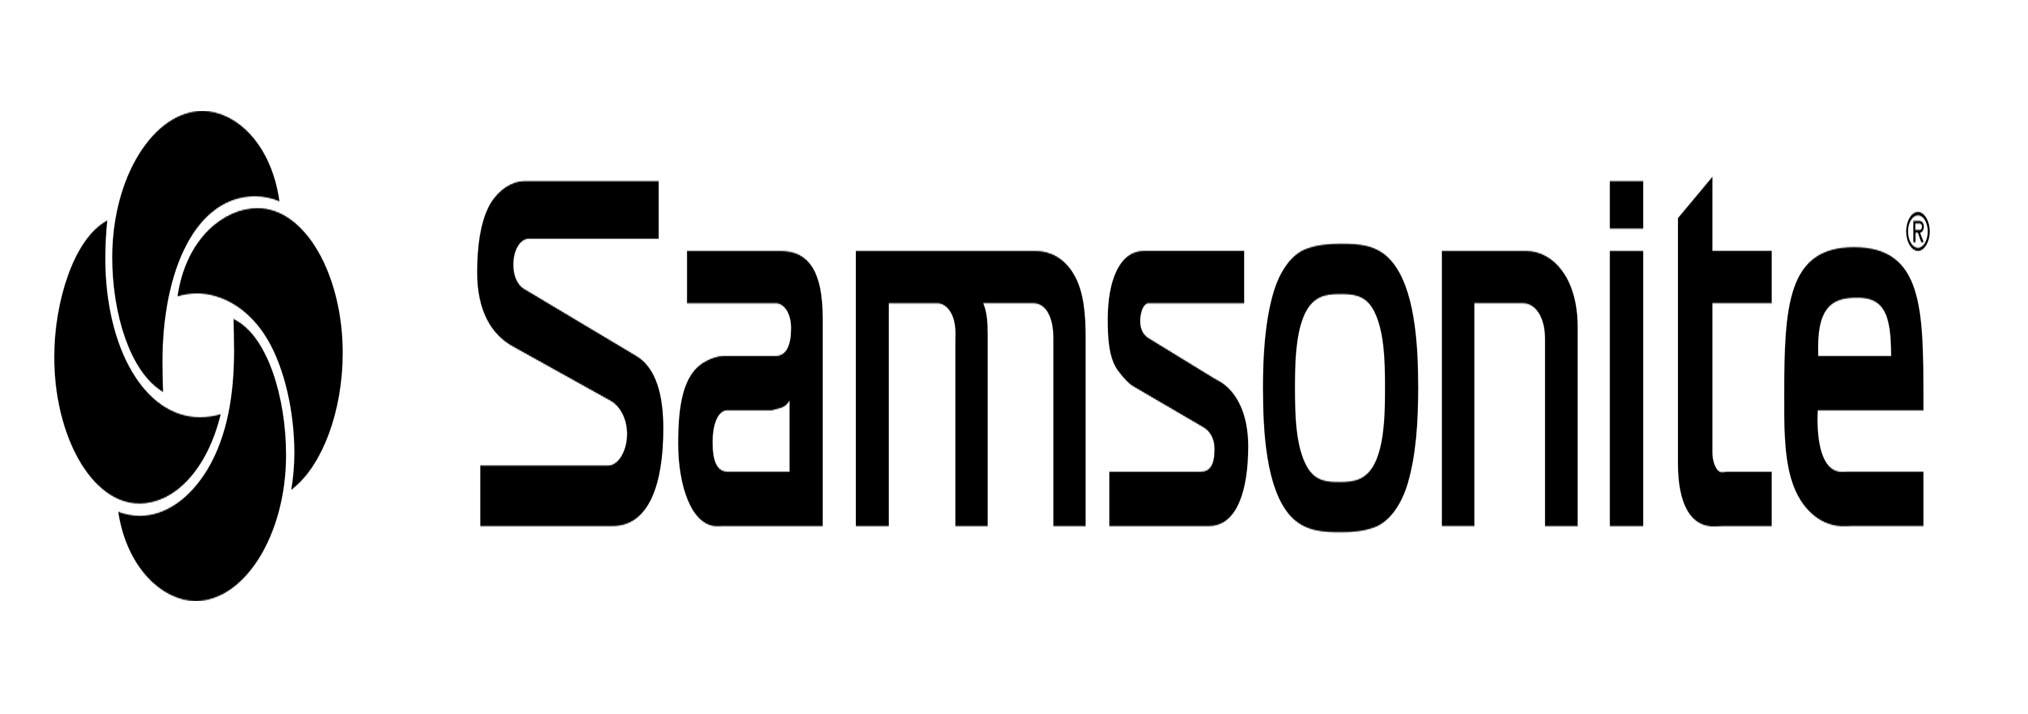 Samsonite - תשארו מעודכנים למבצעים סמסונייט